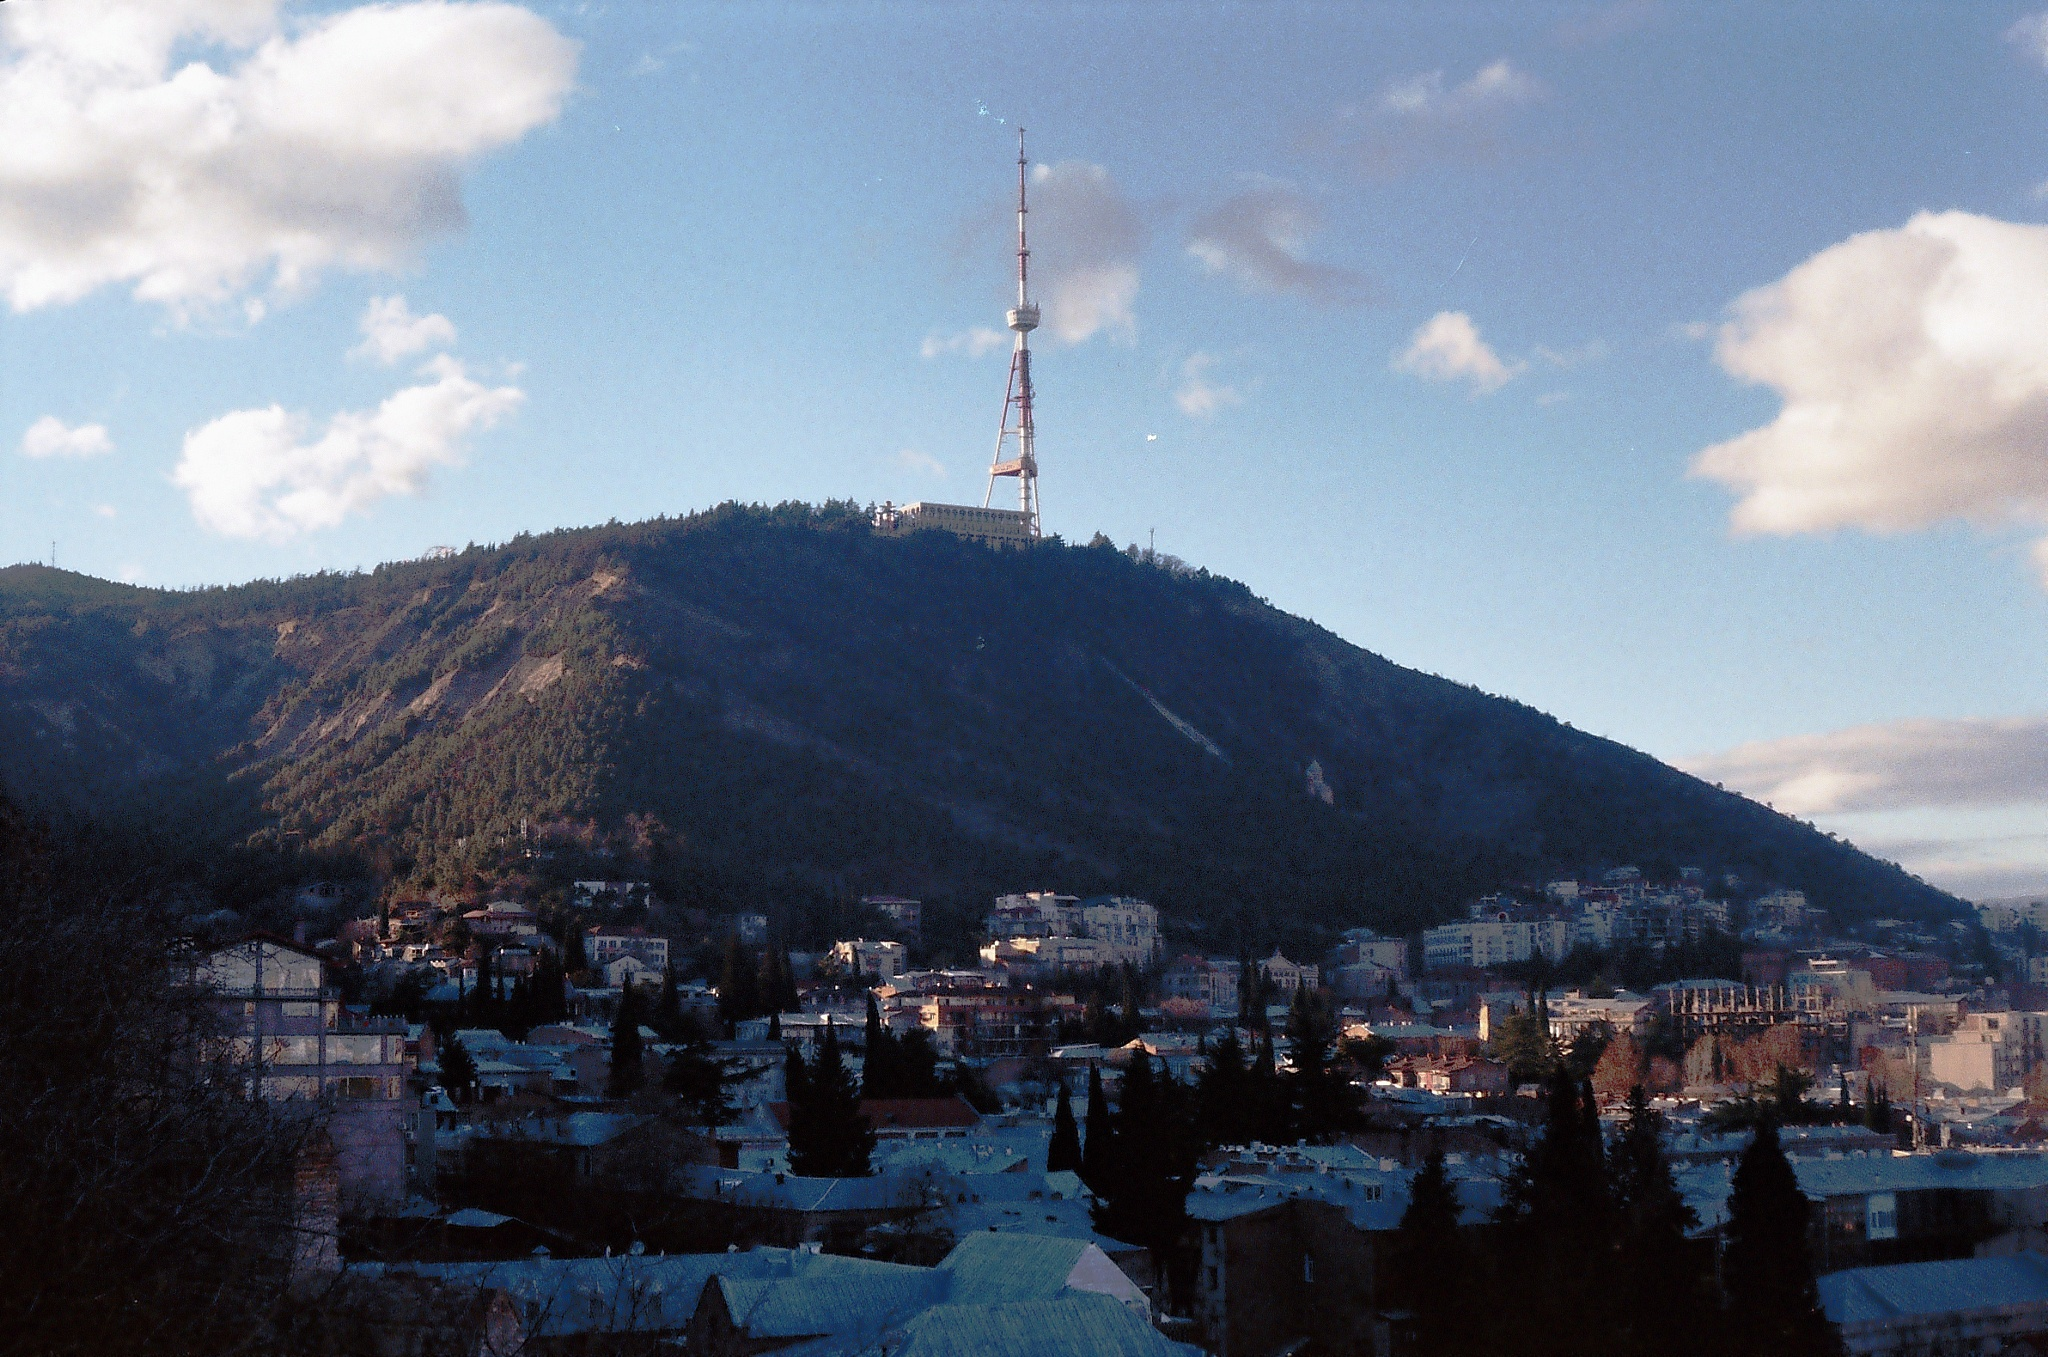 tbilisi by Khatia Gelashvili